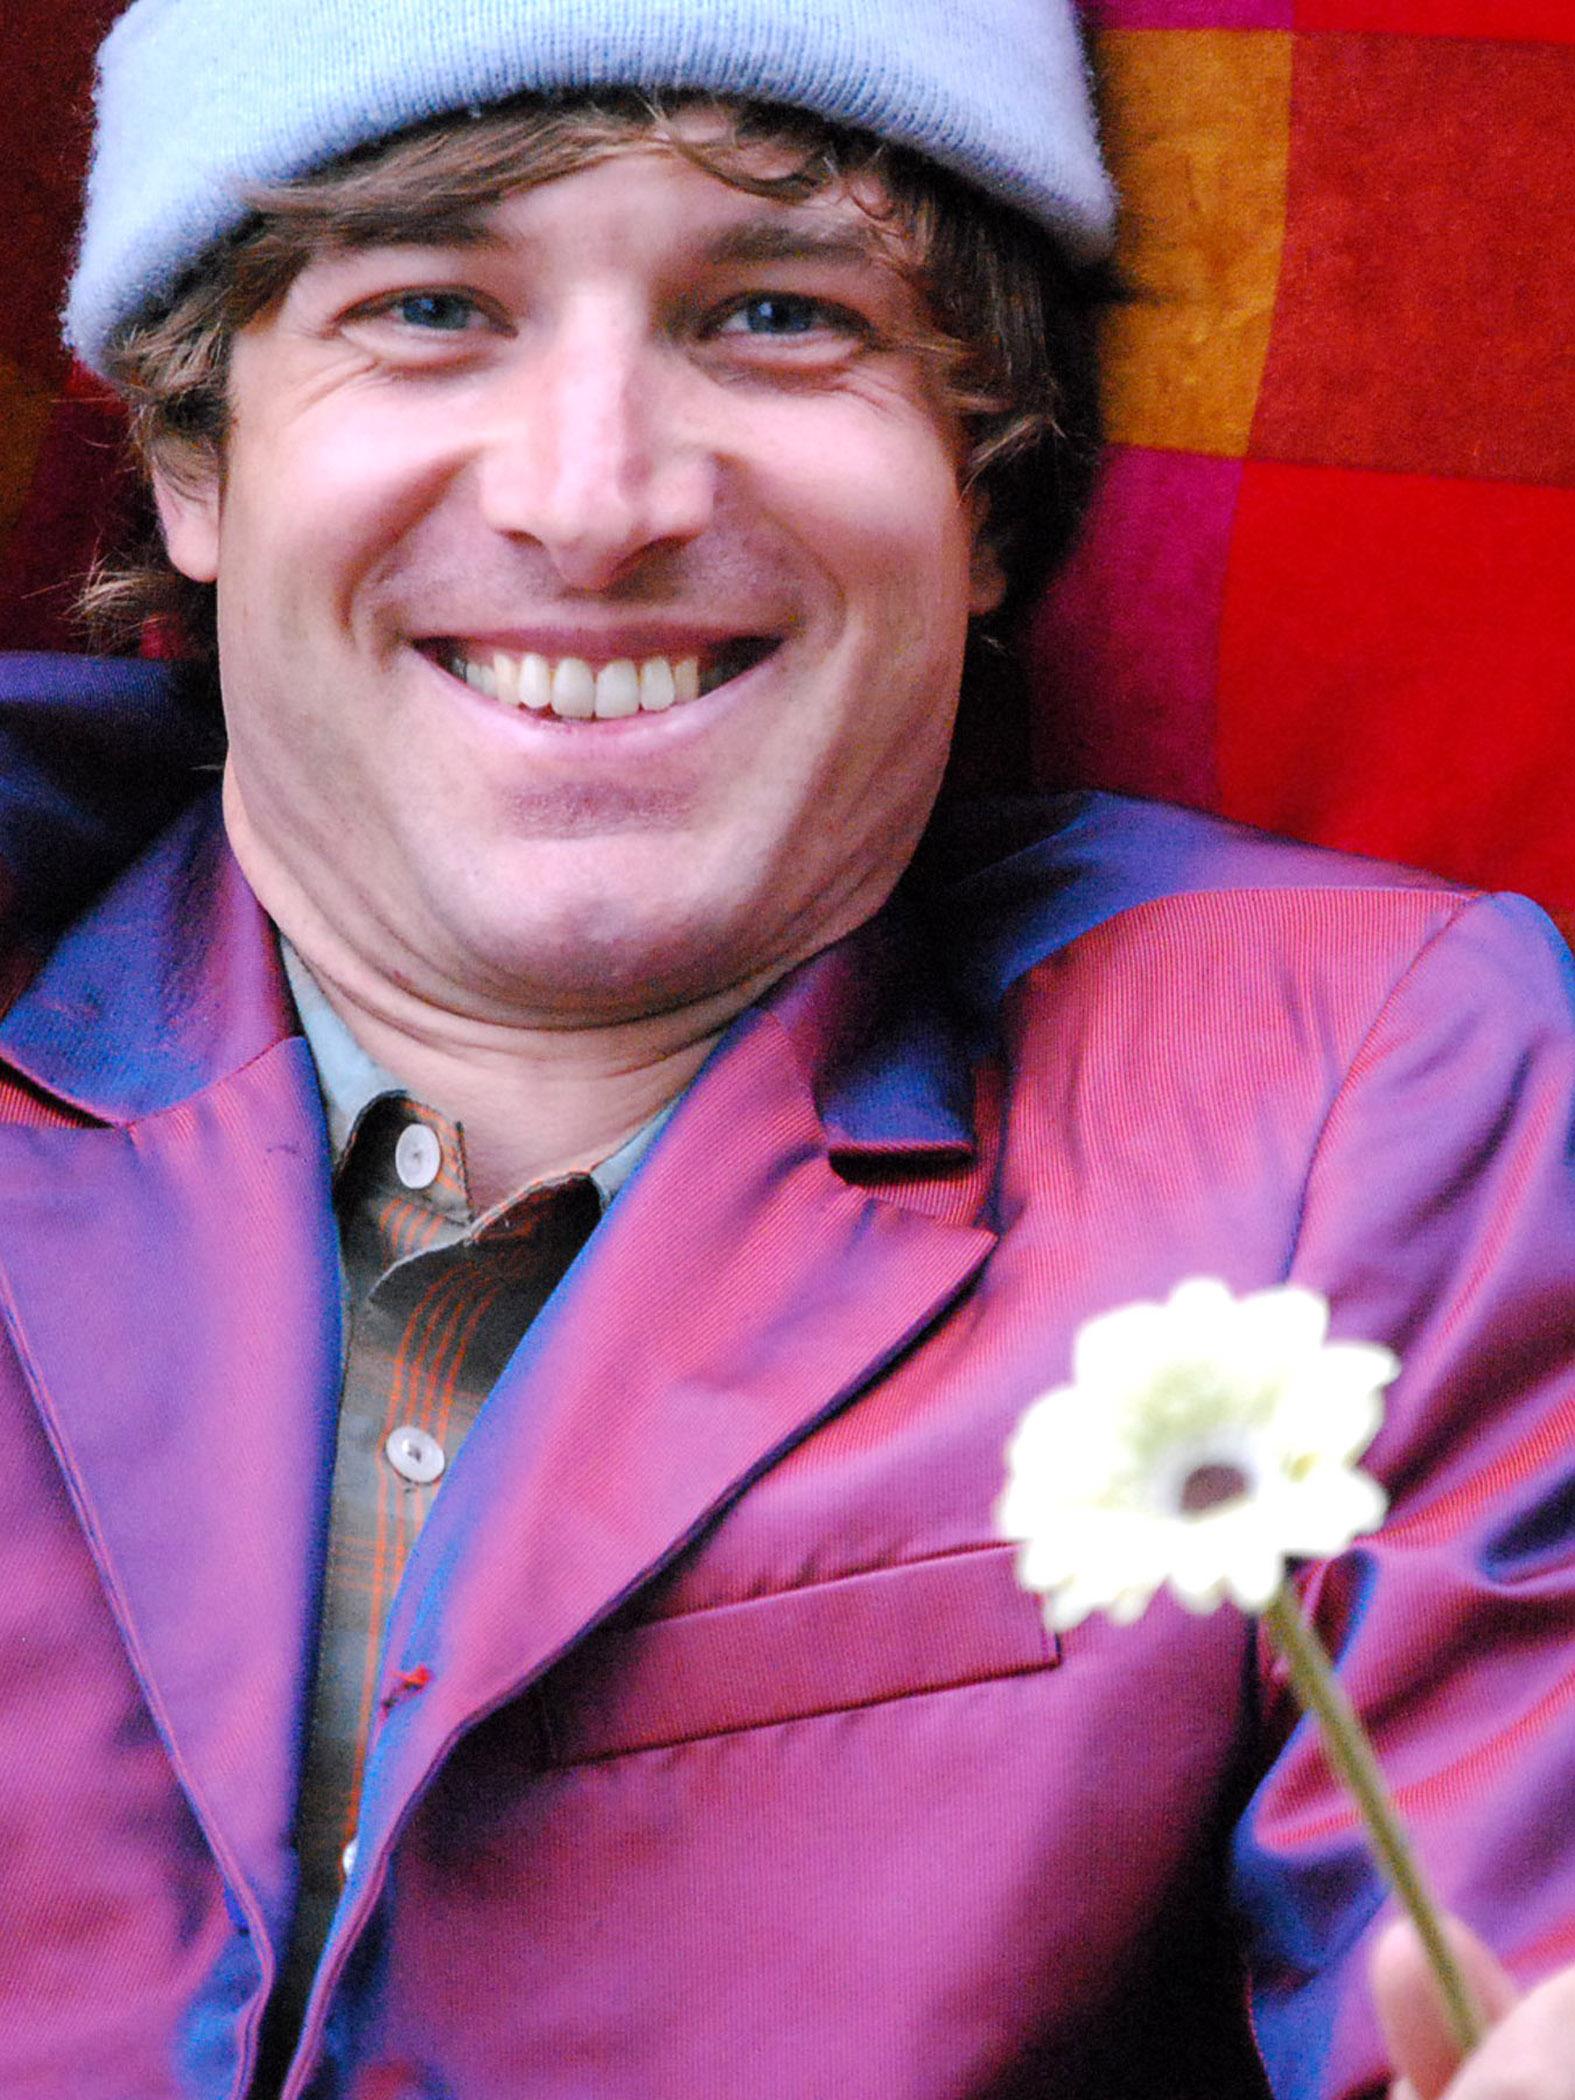 Daniel Forlano